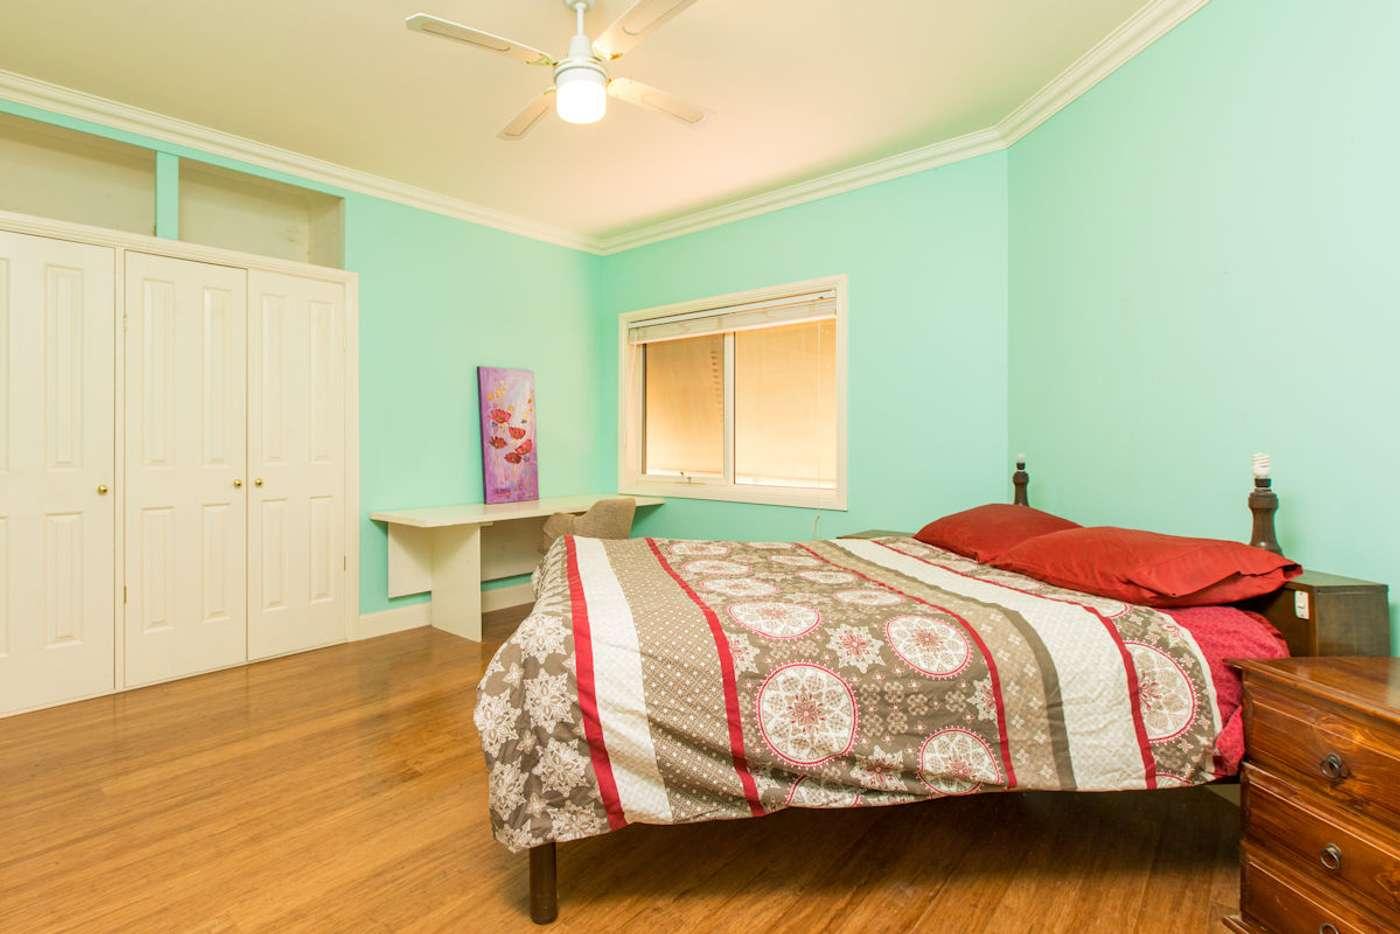 Sixth view of Homely house listing, 3510 Deakin Avenue, Mildura VIC 3500